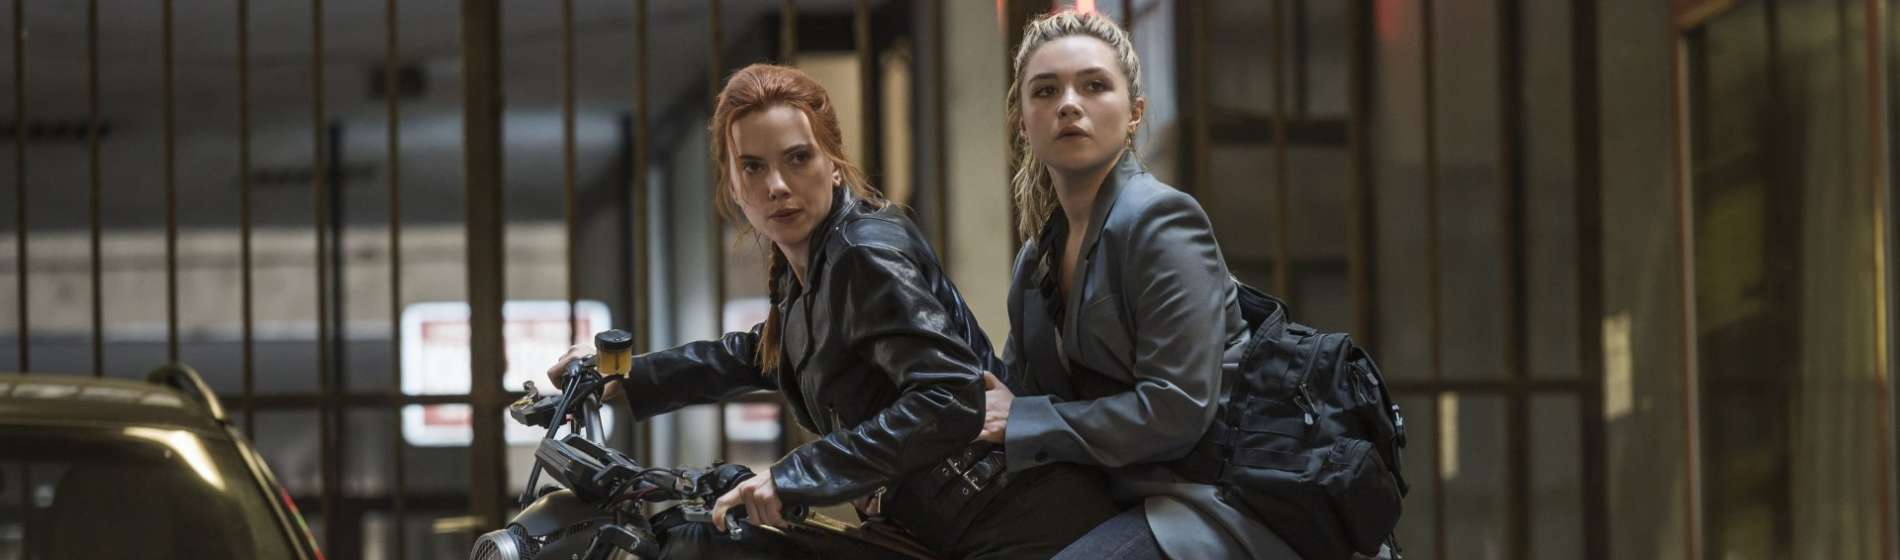 Scarlett Johansson Florence Pugh Black Widow movie